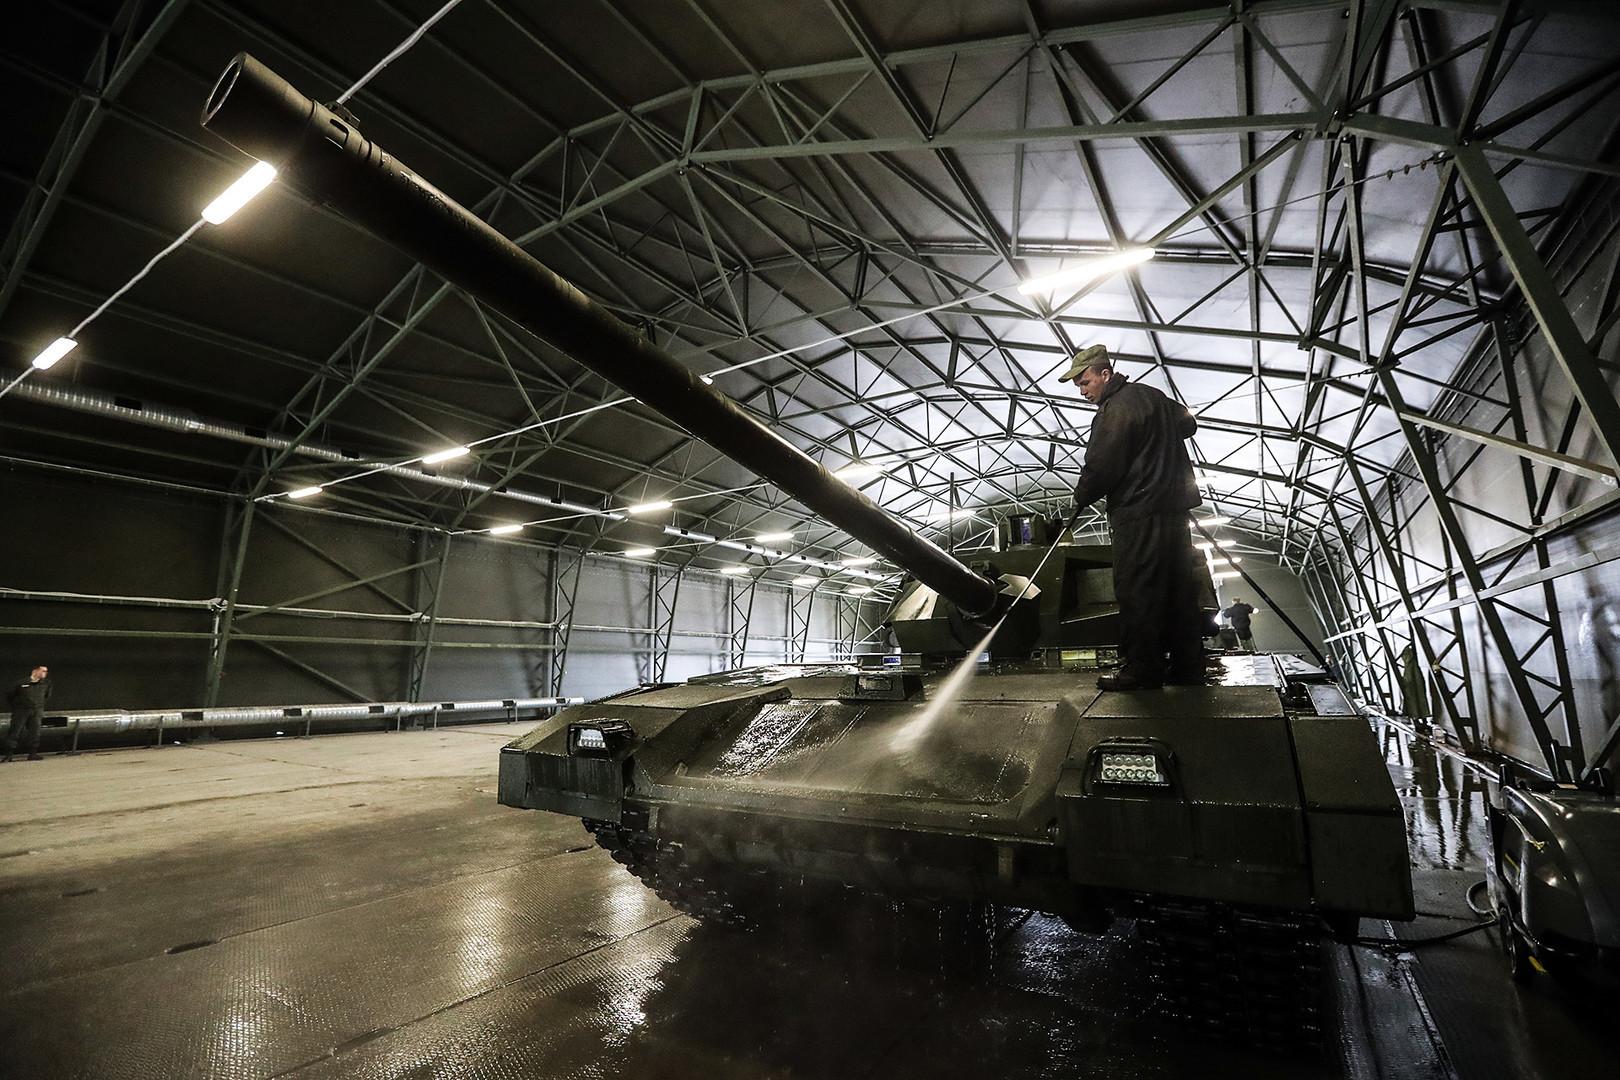 Vojnik pere tenk T-14